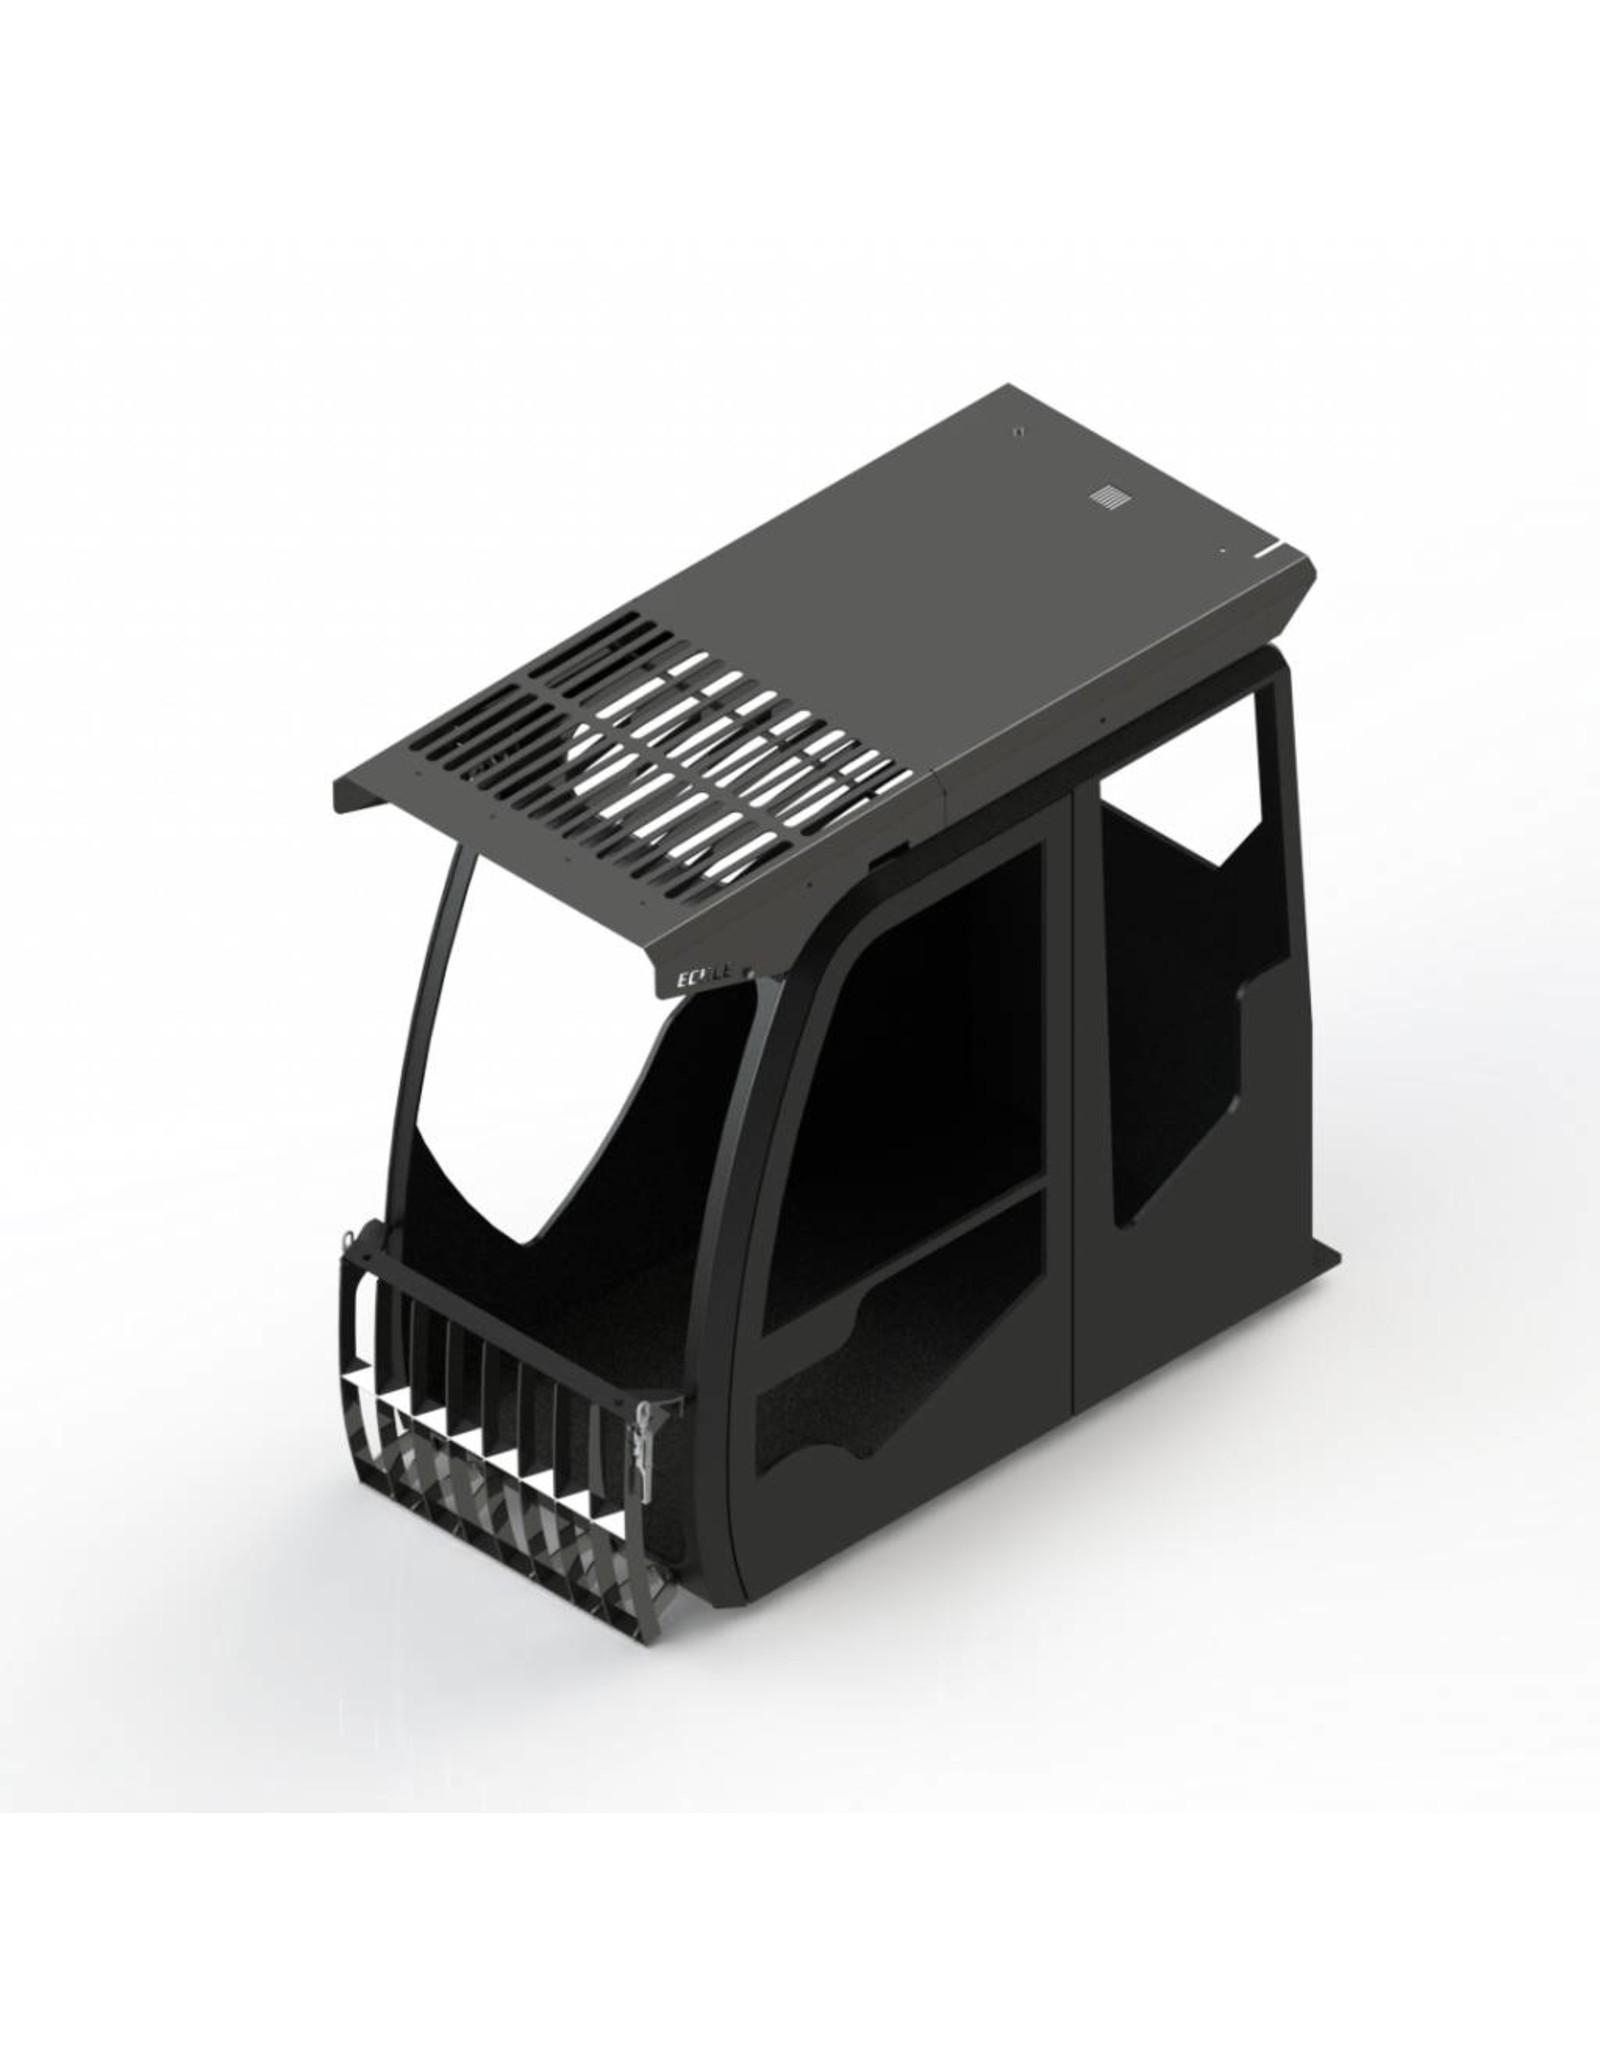 Echle Hartstahl GmbH FOPS for JCB JS160LC